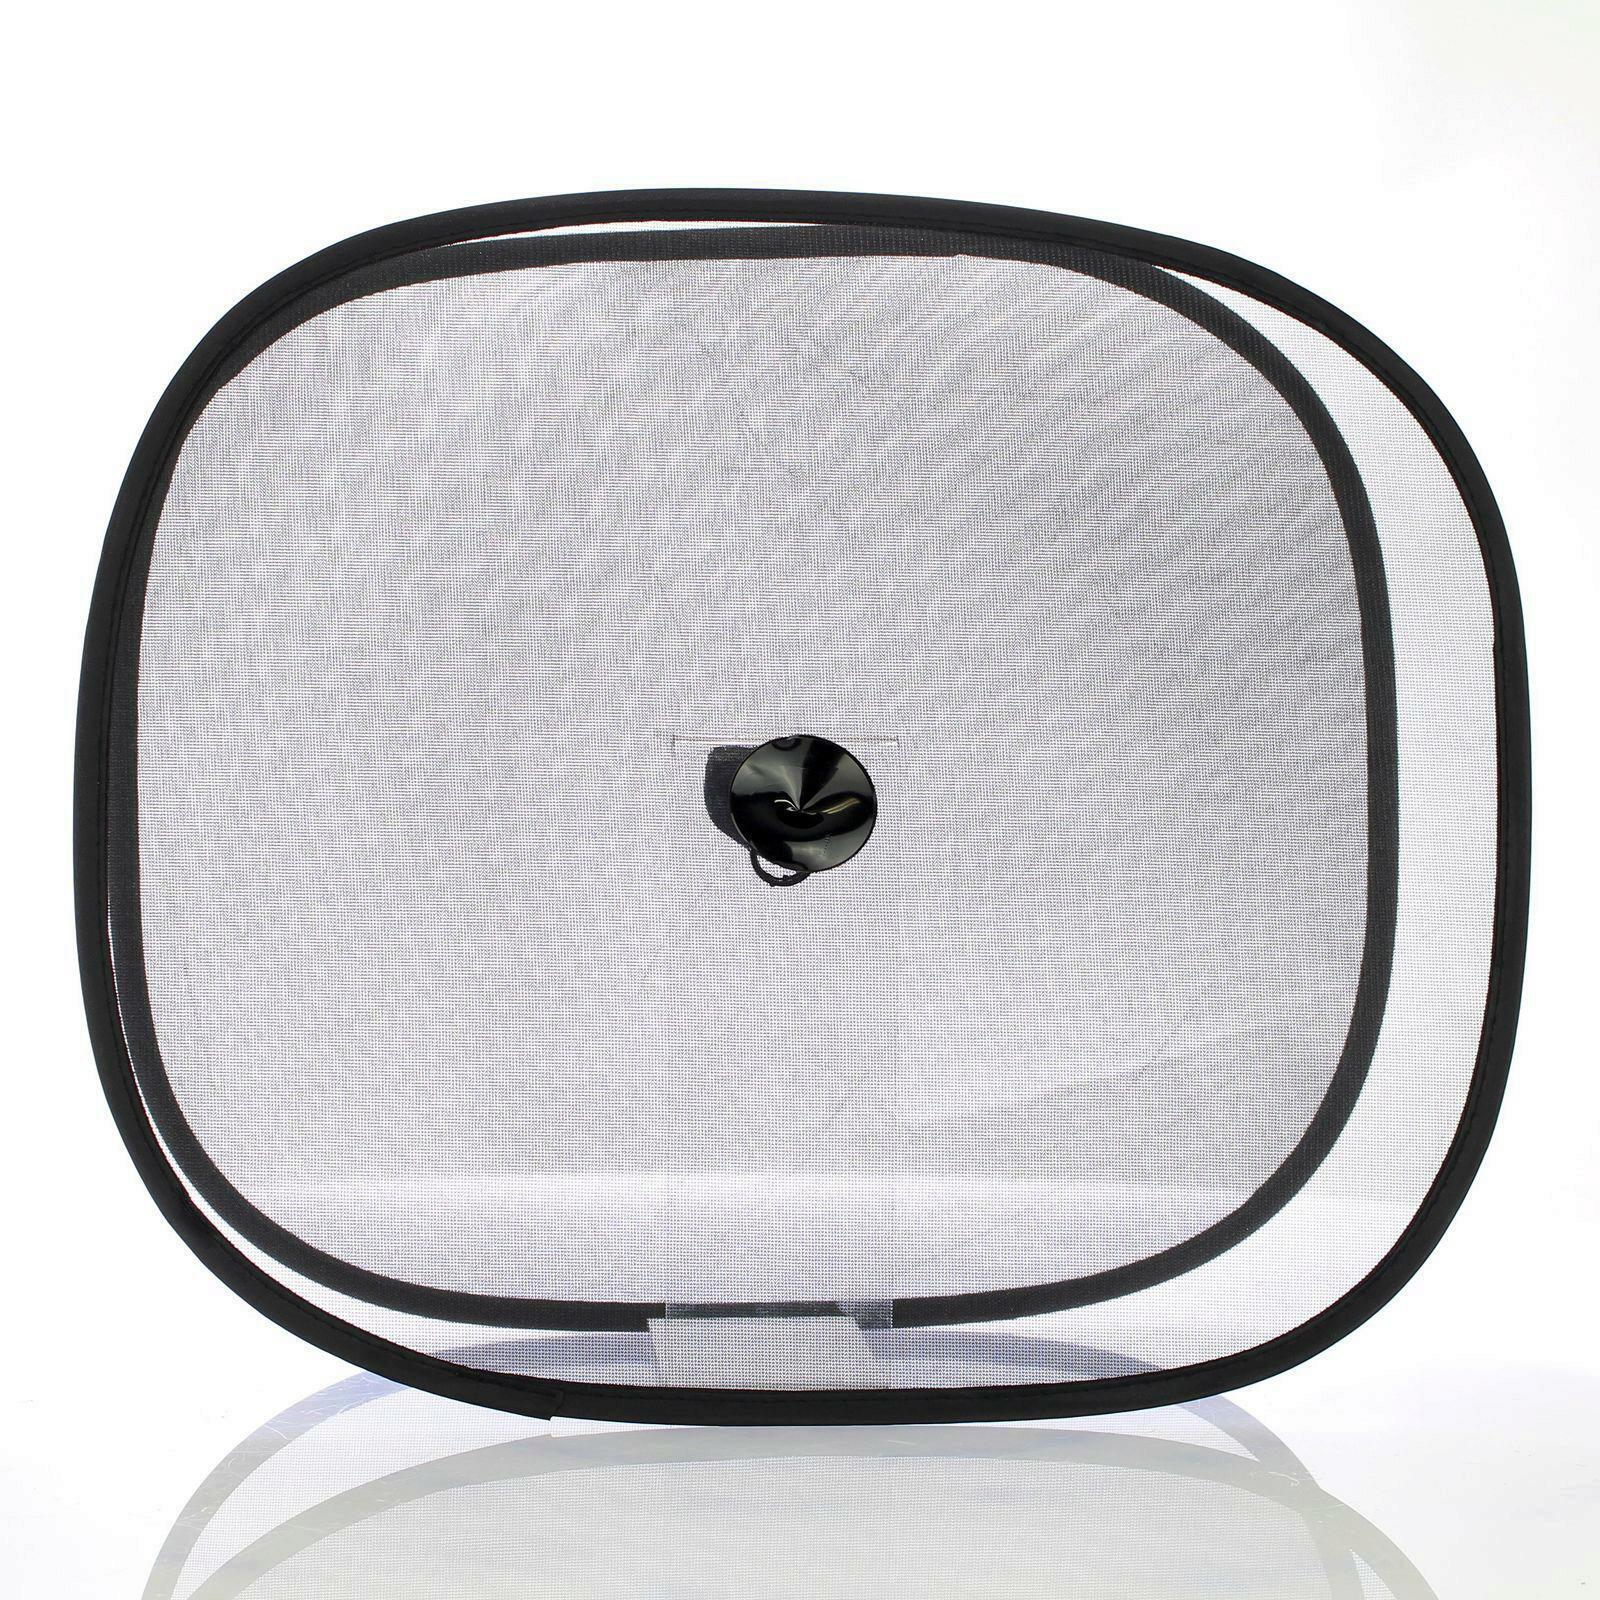 sonnenblende f r hyundai i20 pb pbt lott. Black Bedroom Furniture Sets. Home Design Ideas